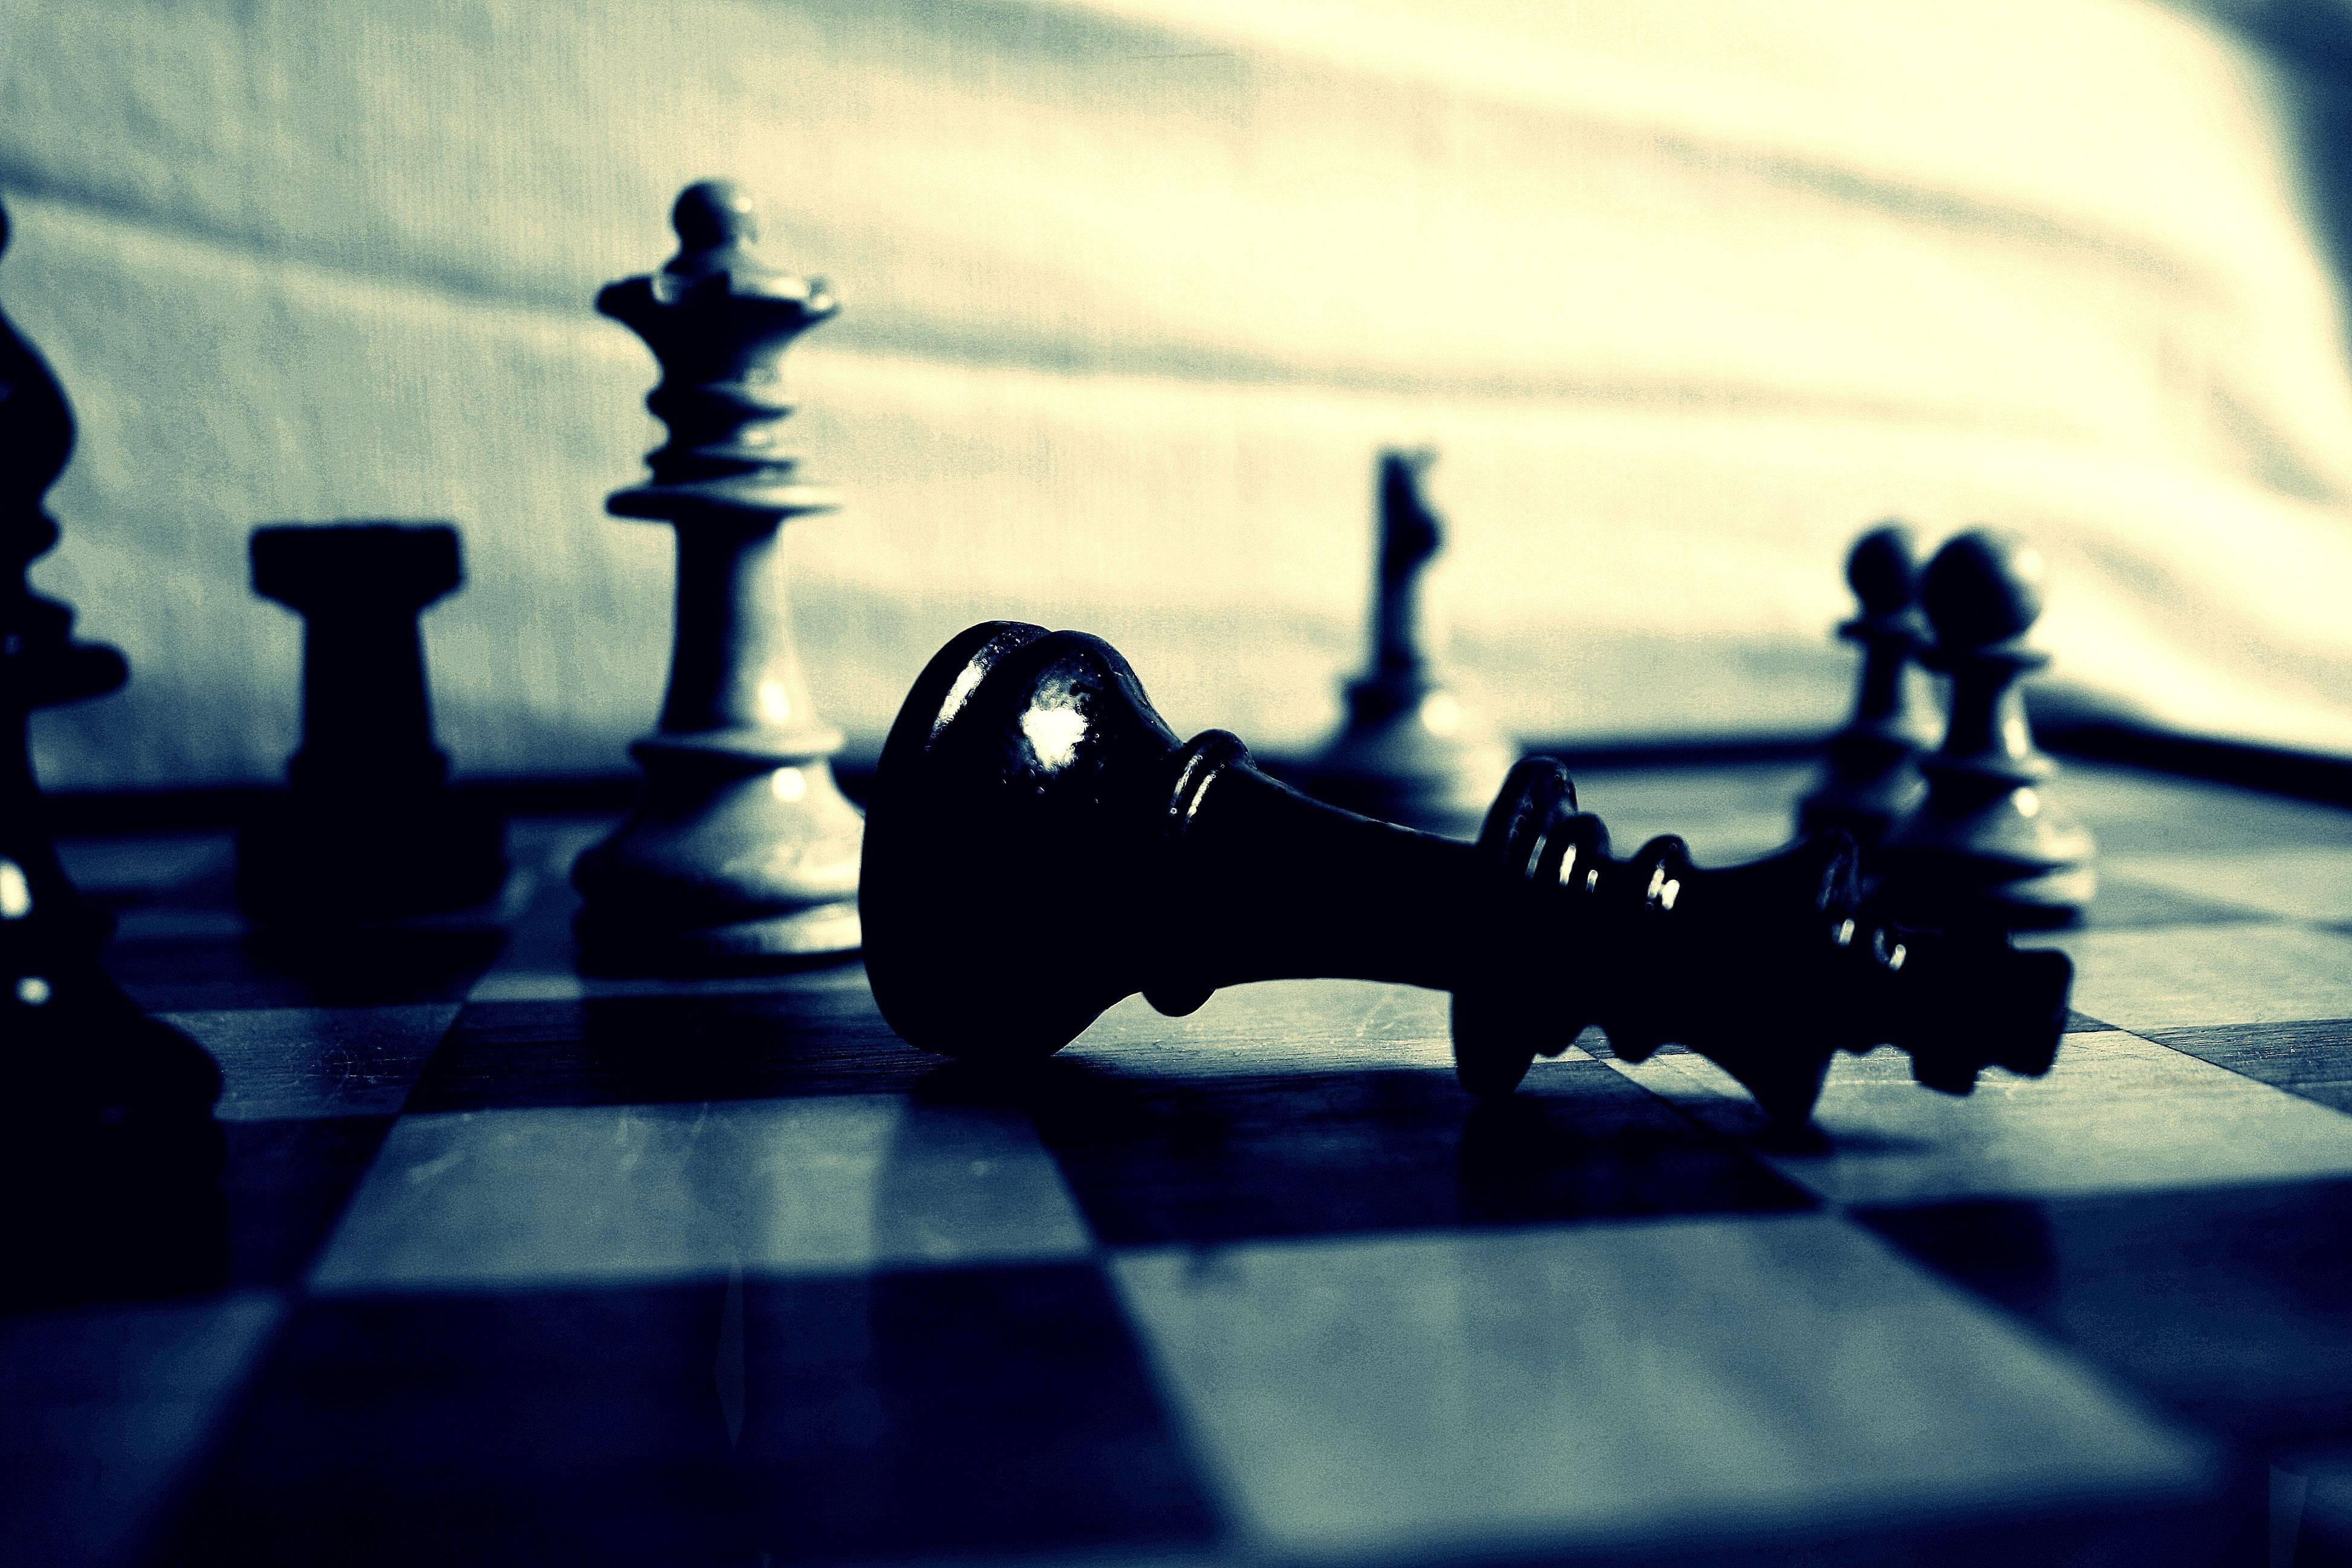 Chess King Wallpaper